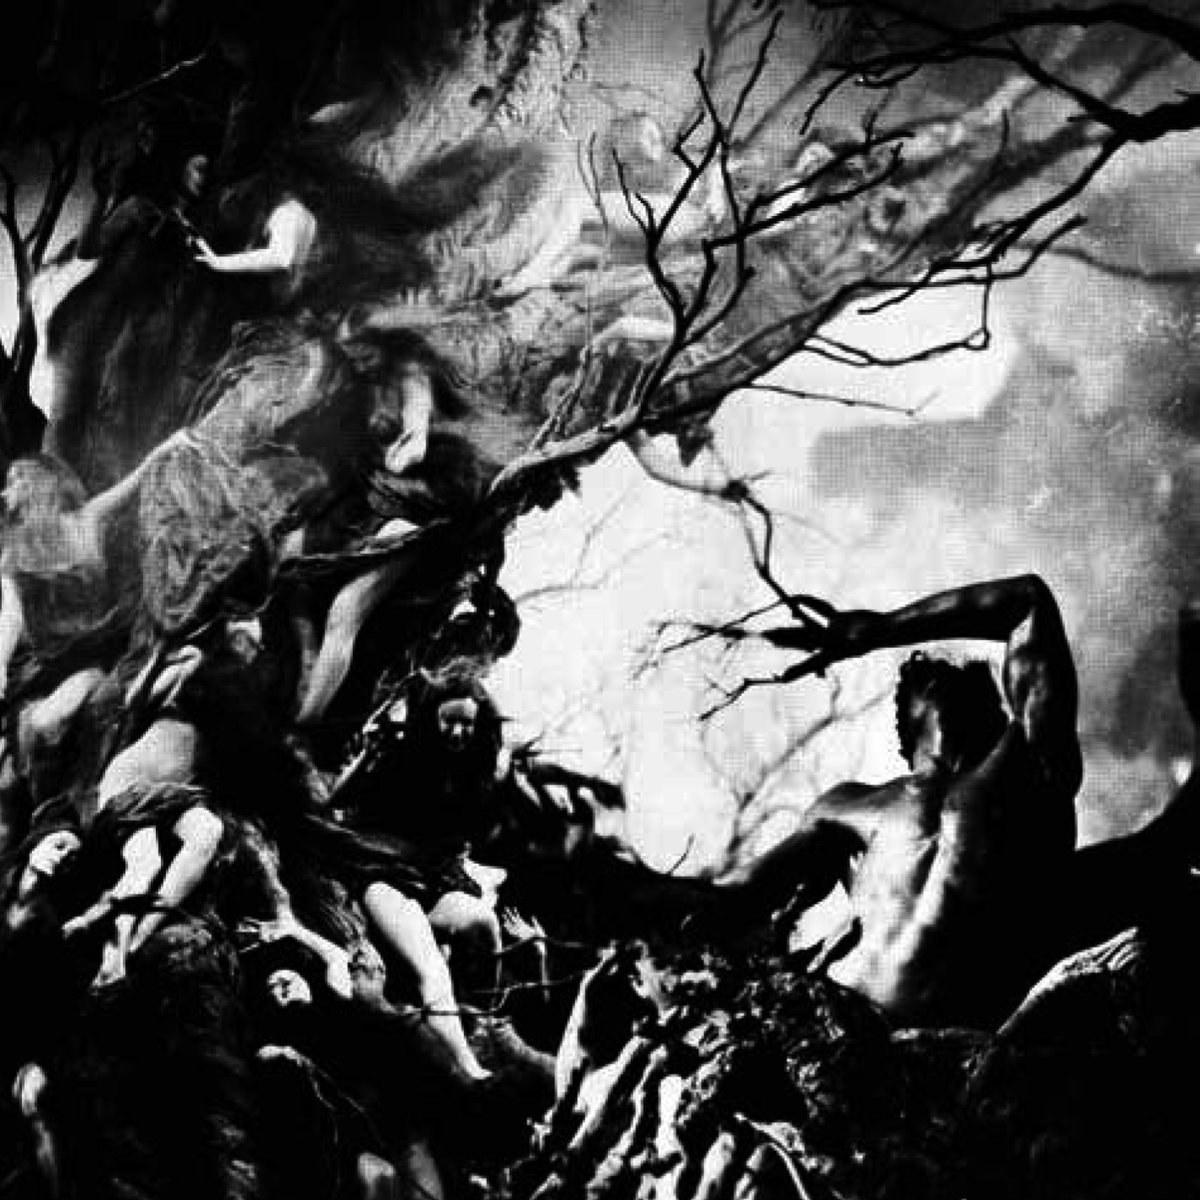 Reviews for Abigor - Höllenzwang (Chronicles of Perdition)